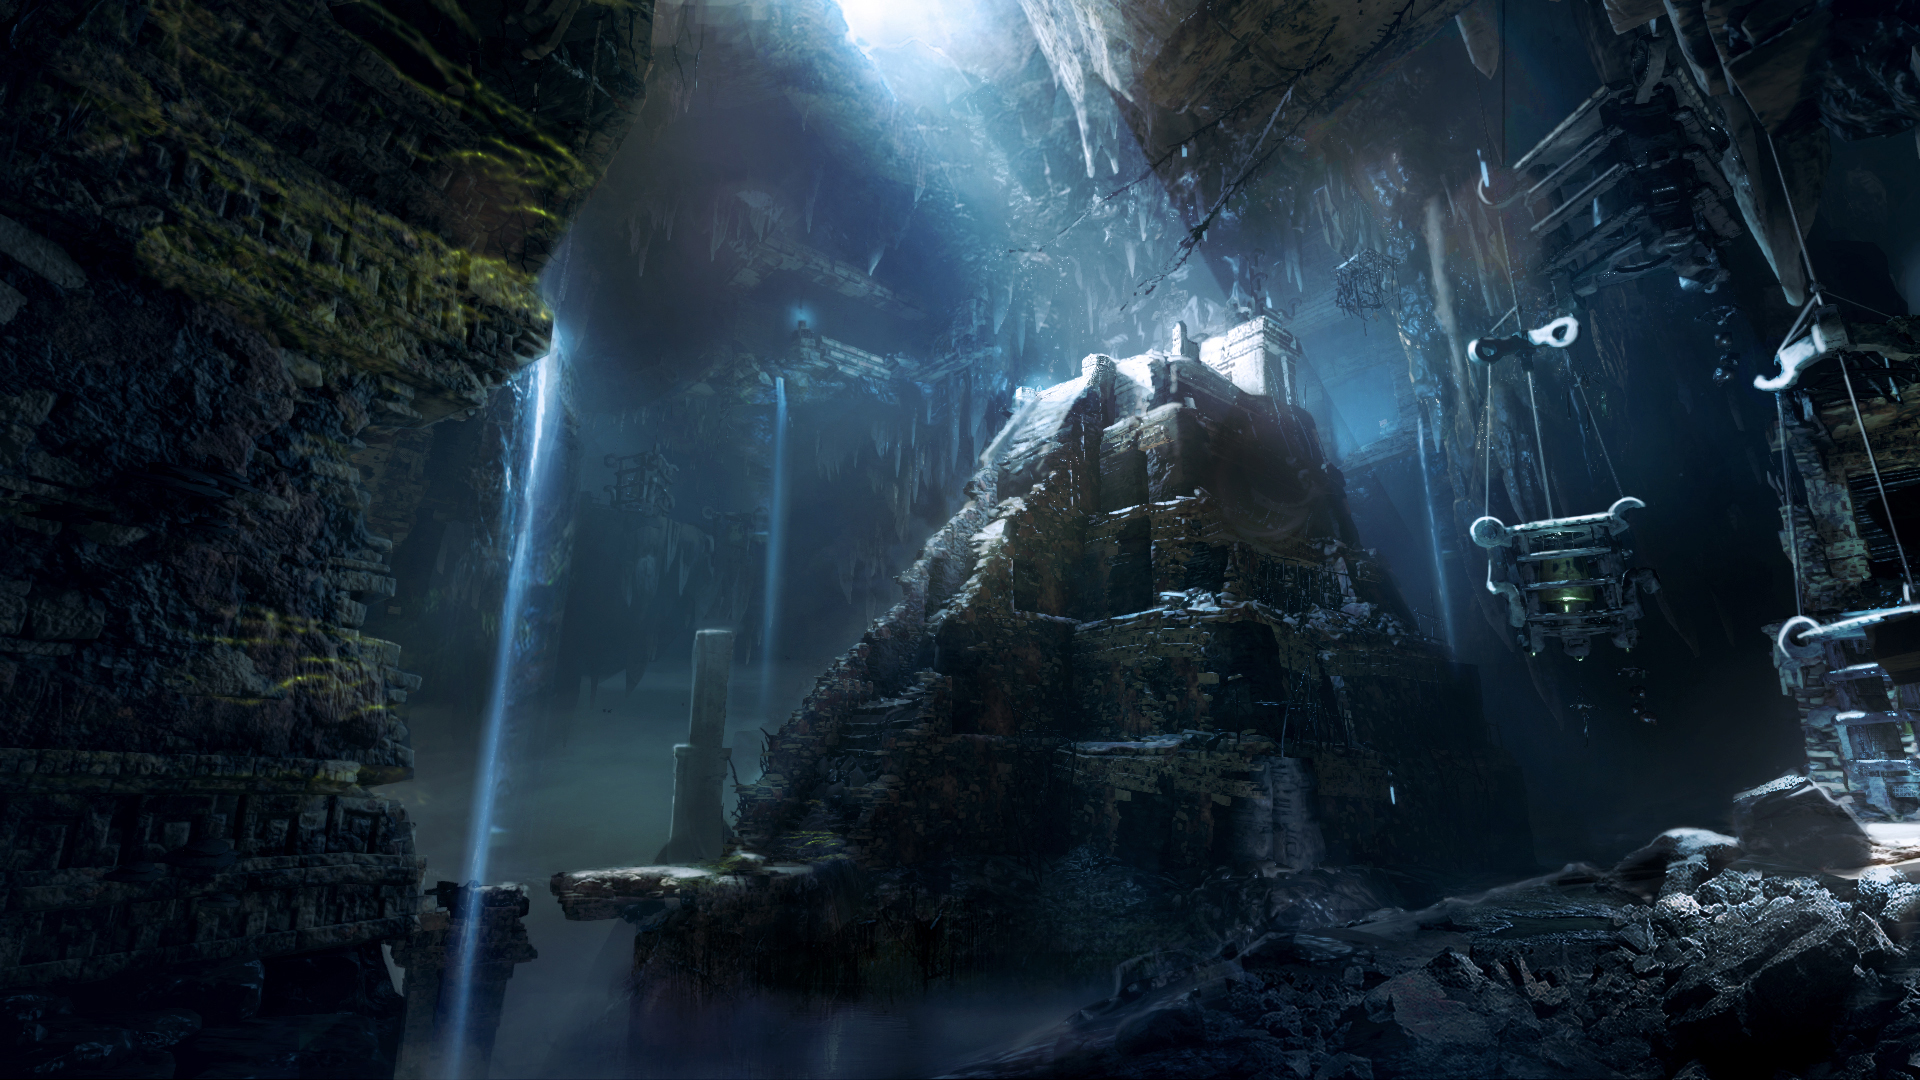 http://www.idgtv.es/archivos/201804/shadow-of-the-tomb-raider-art-img3.jpg